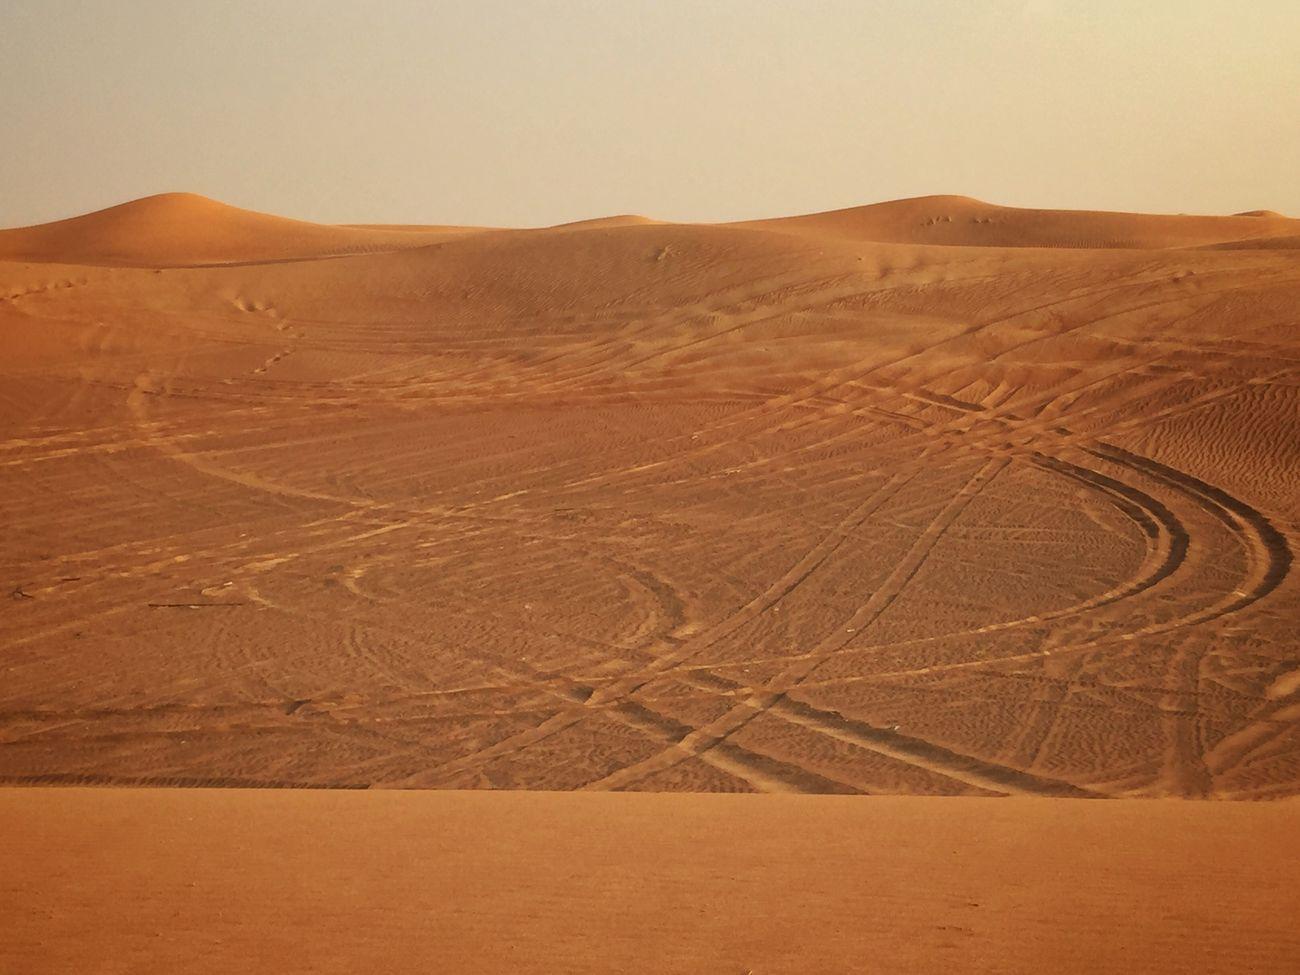 Deserts Around The World Desert Beauty Desertsafari Desert Track Beautiful Creation Dubai Desert